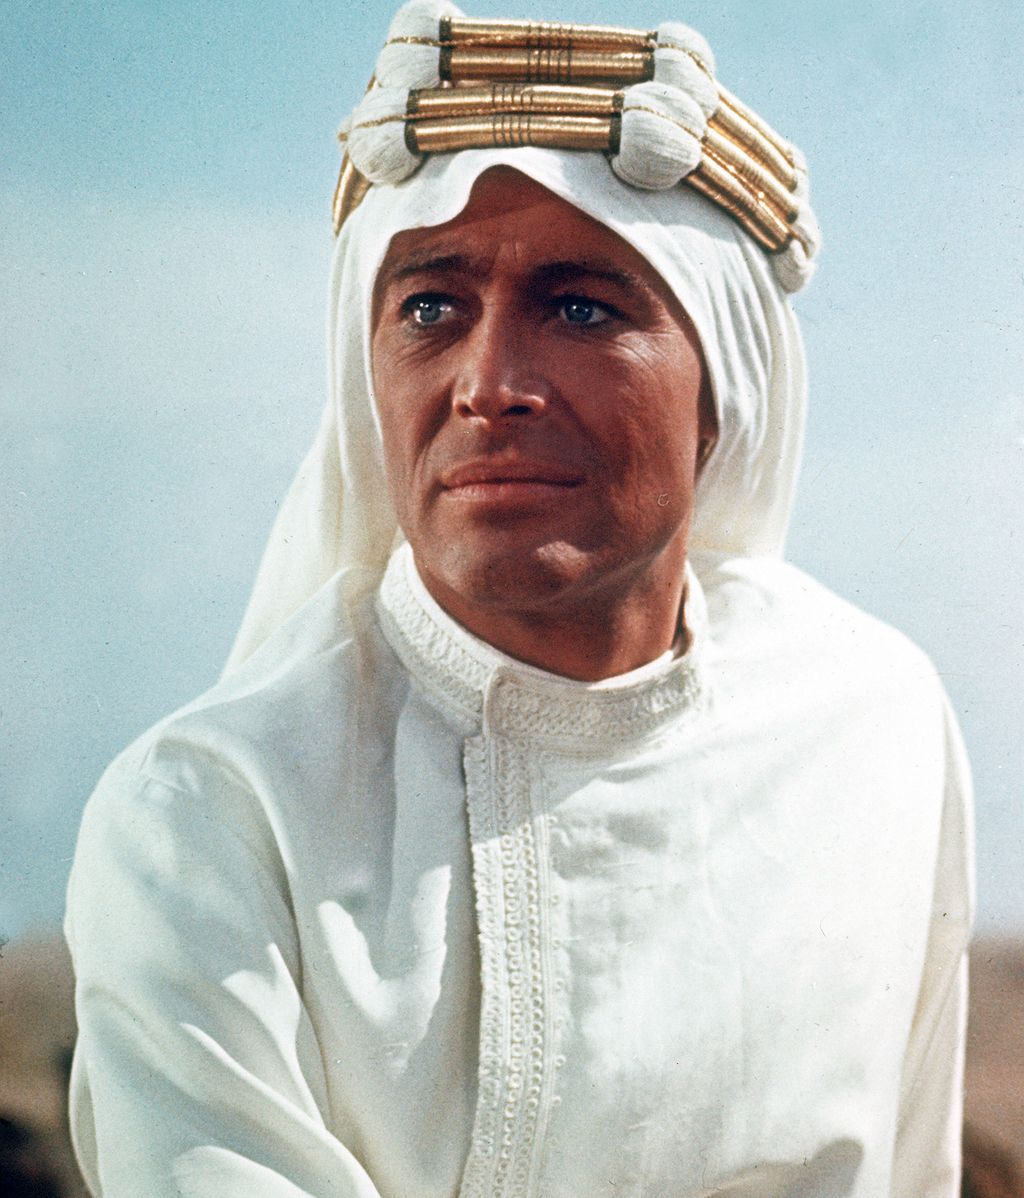 Famoso por su personaje de Lawrence de Arabia